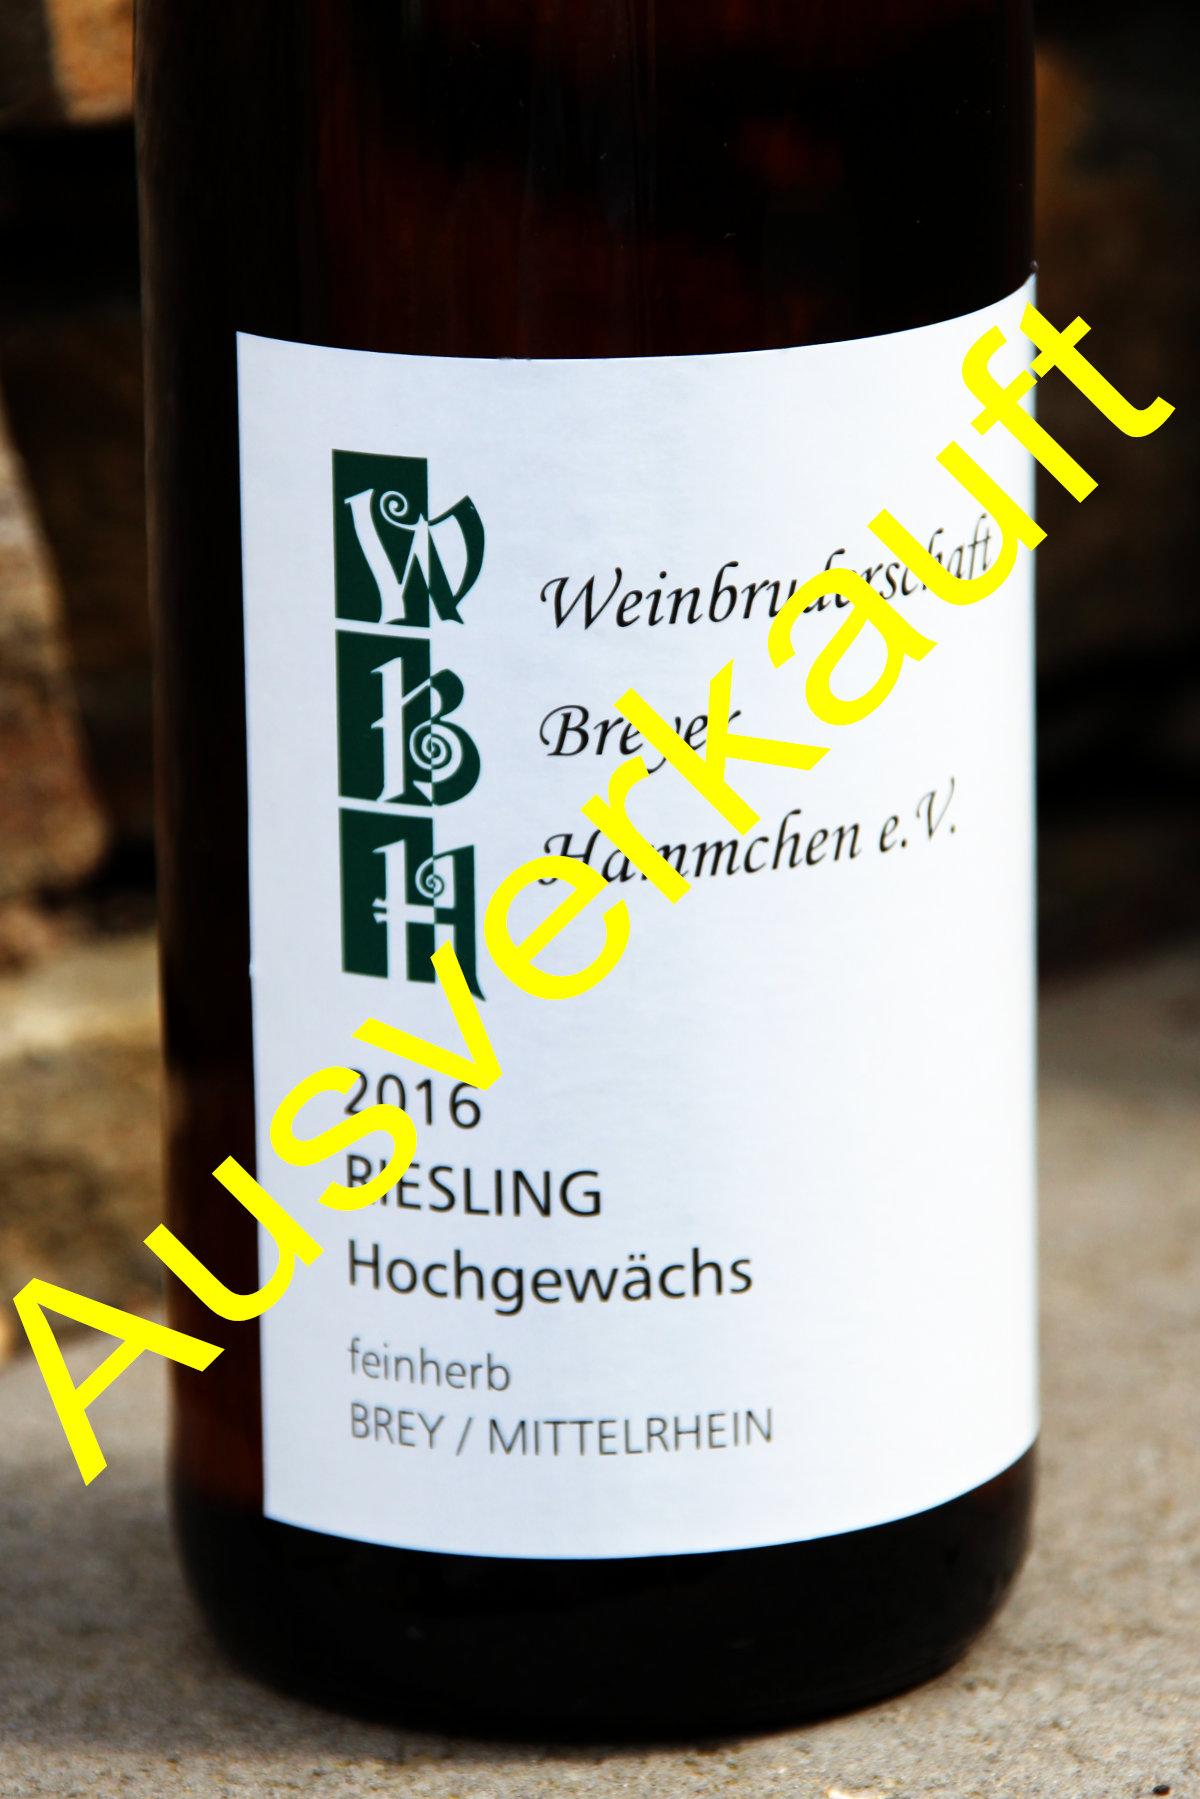 Breyer Hämmchen Hochgewächs –feinherb- 2016 – Silbermedaille